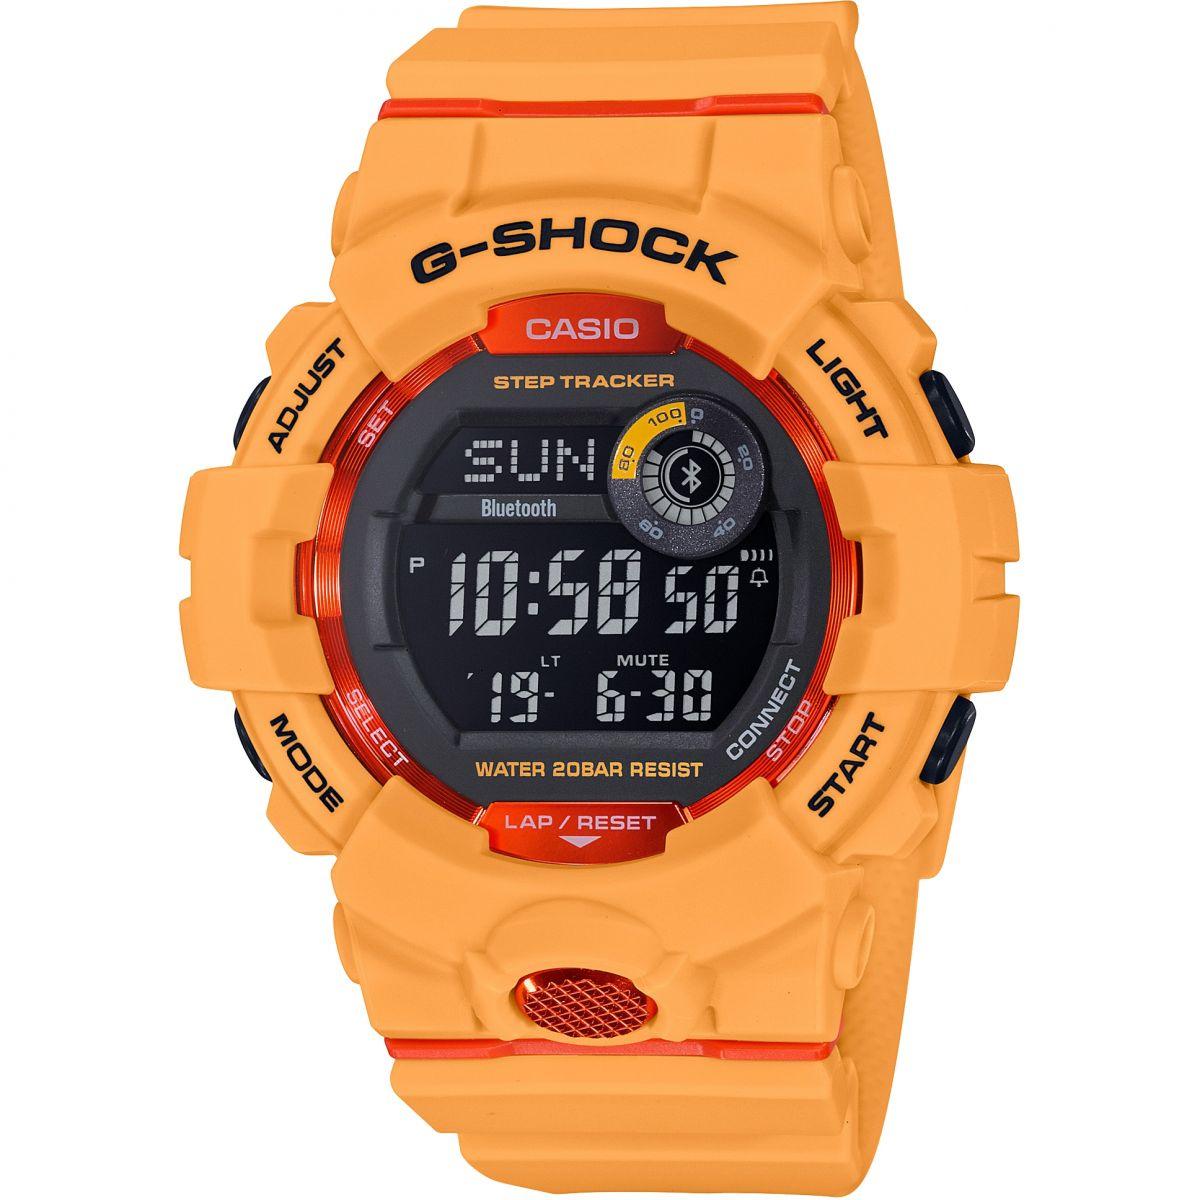 Casio G-Shock GBD-800-4ER £55.25 @ Watch shop